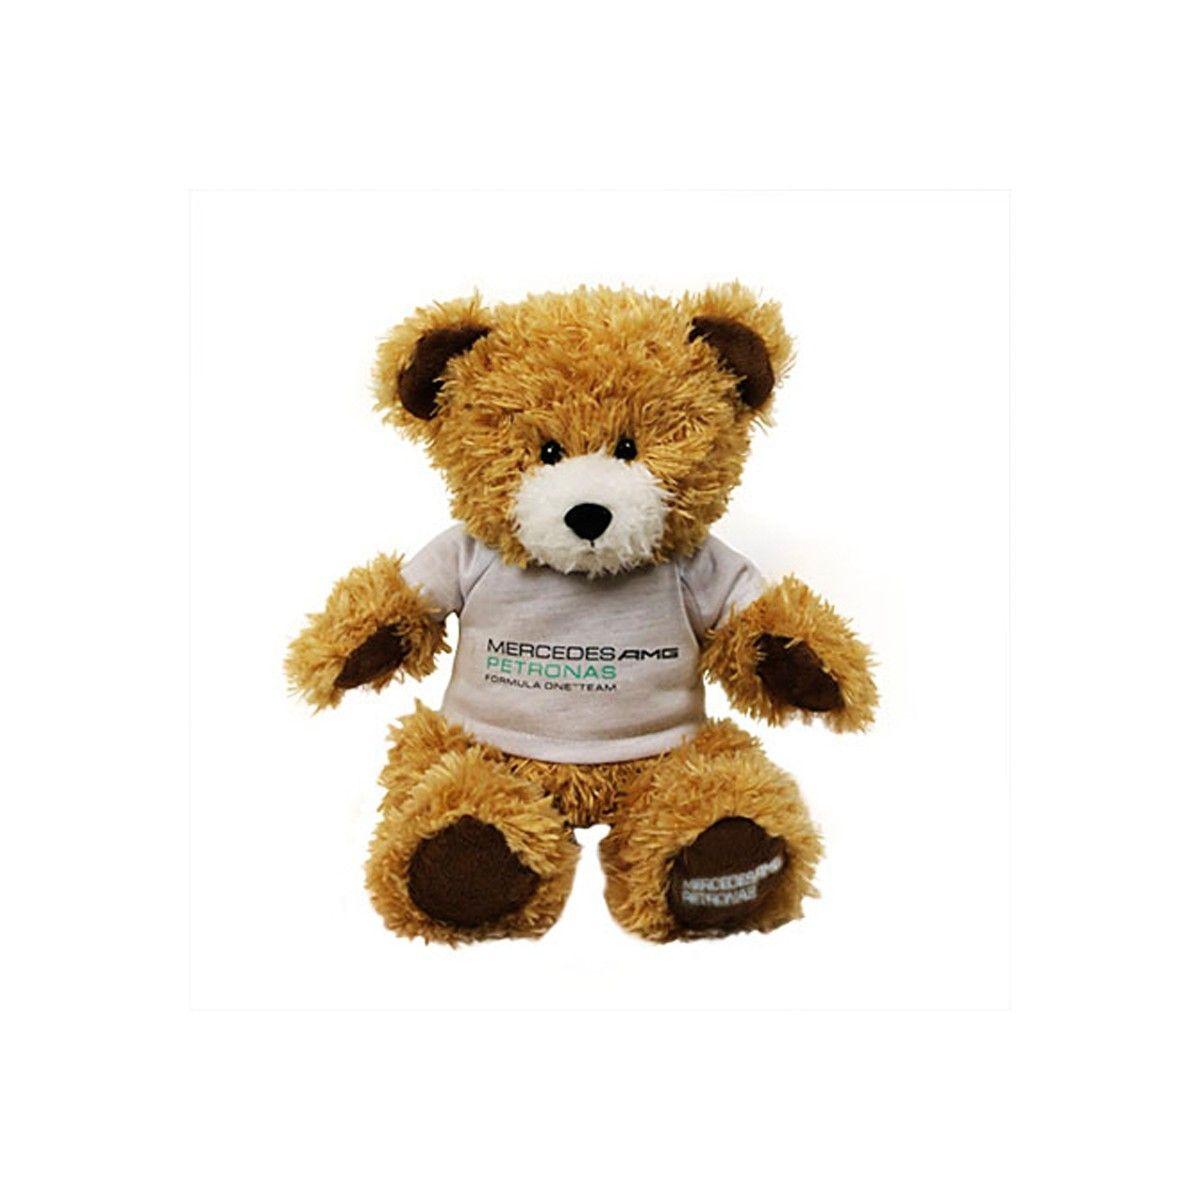 Mercedes amg f1 teddy bear mercedes benz pinterest for Mercedes benz bear